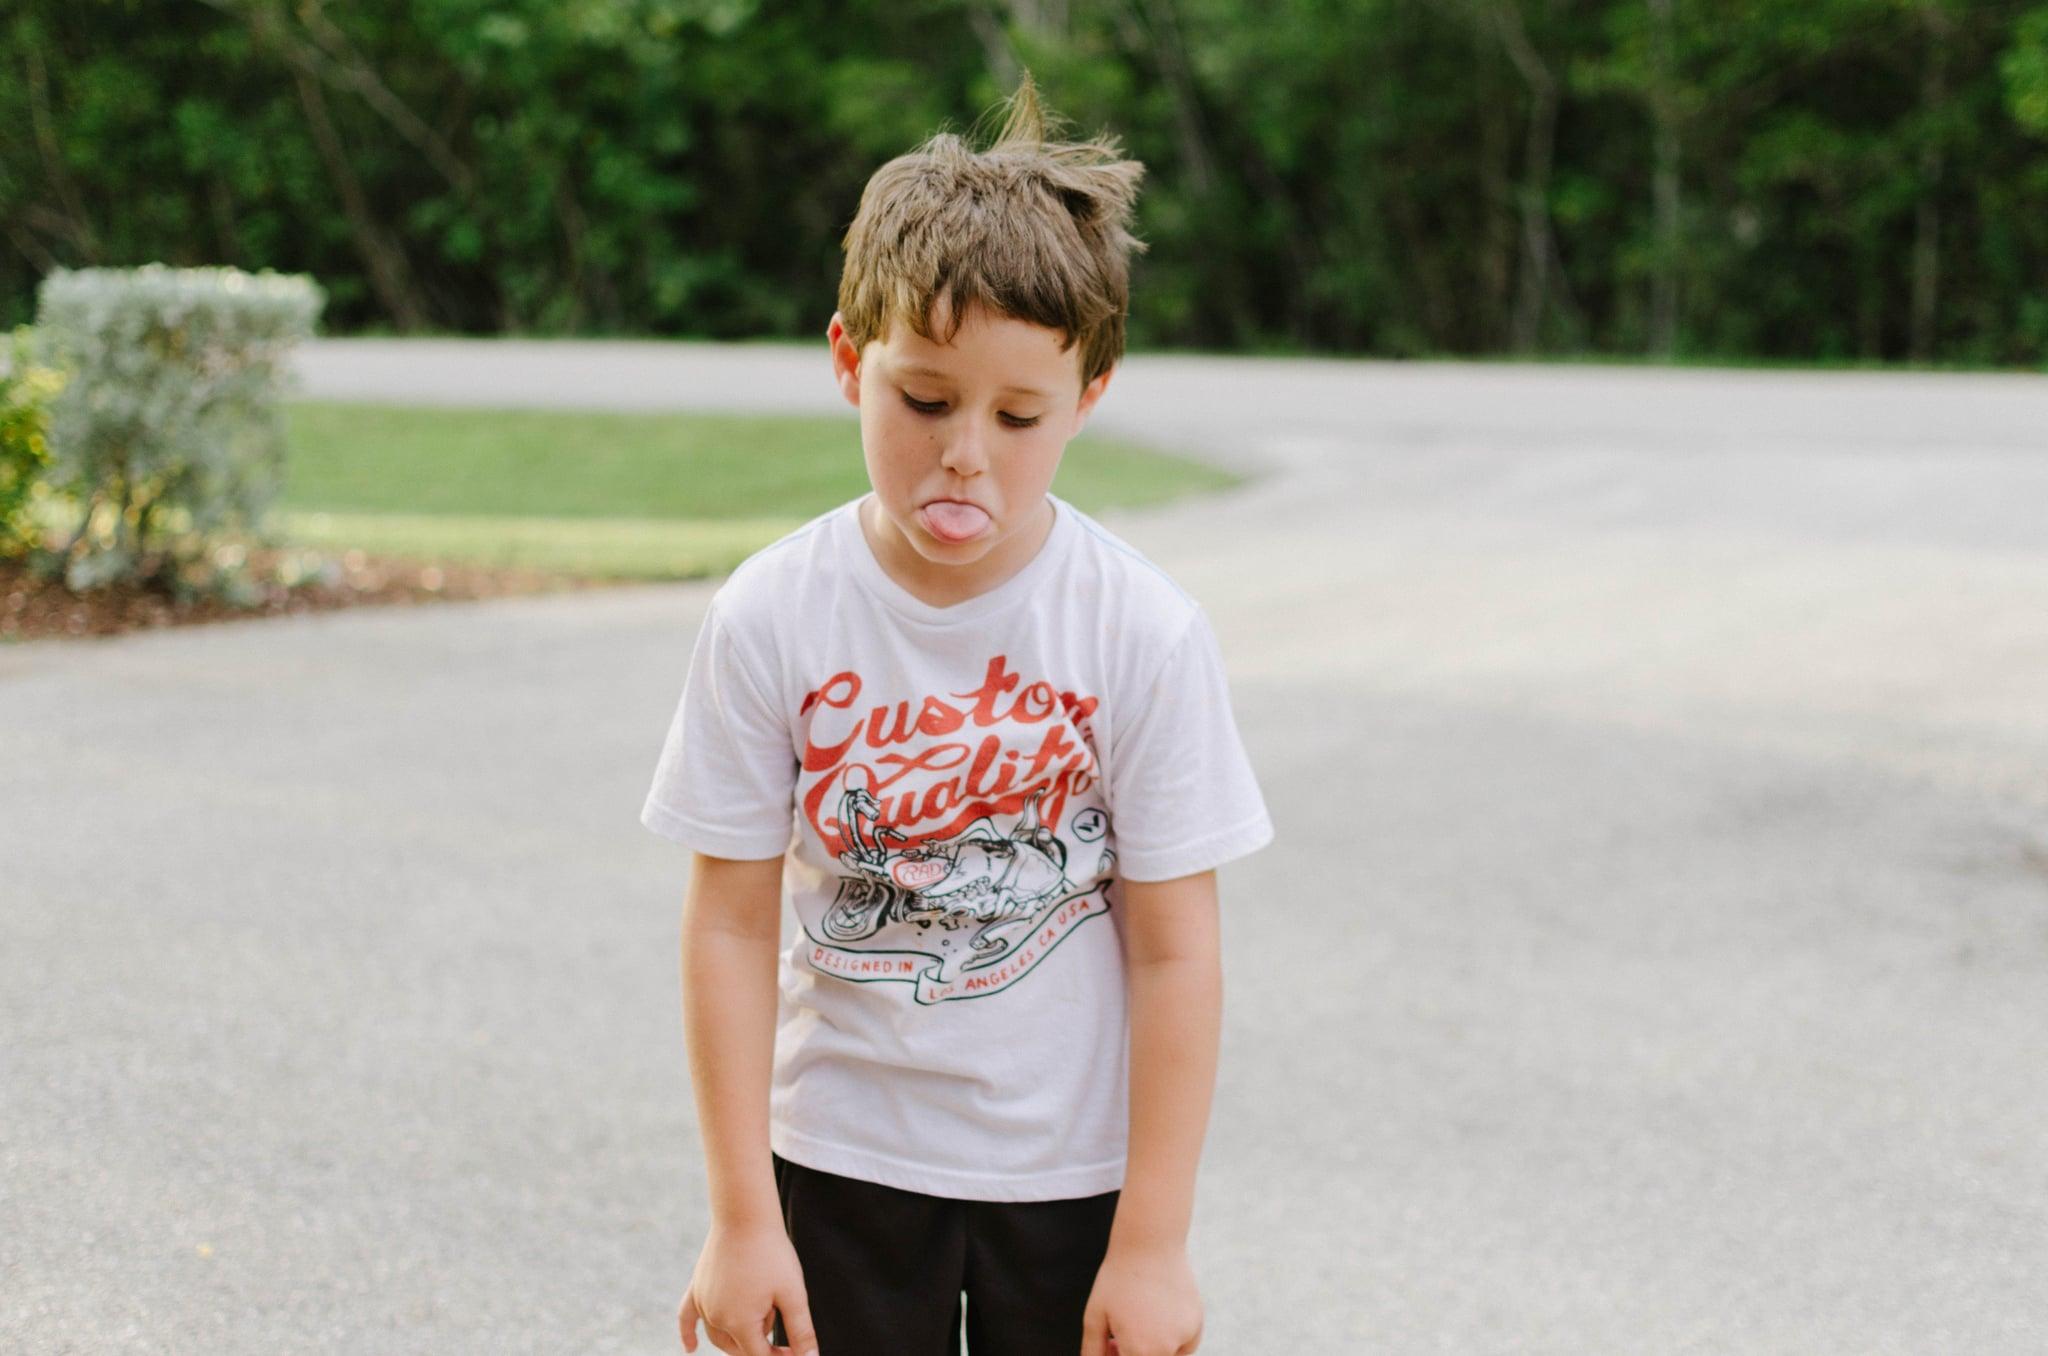 23 Signs Your Kid Needs an Attitude Adjustment ASAP